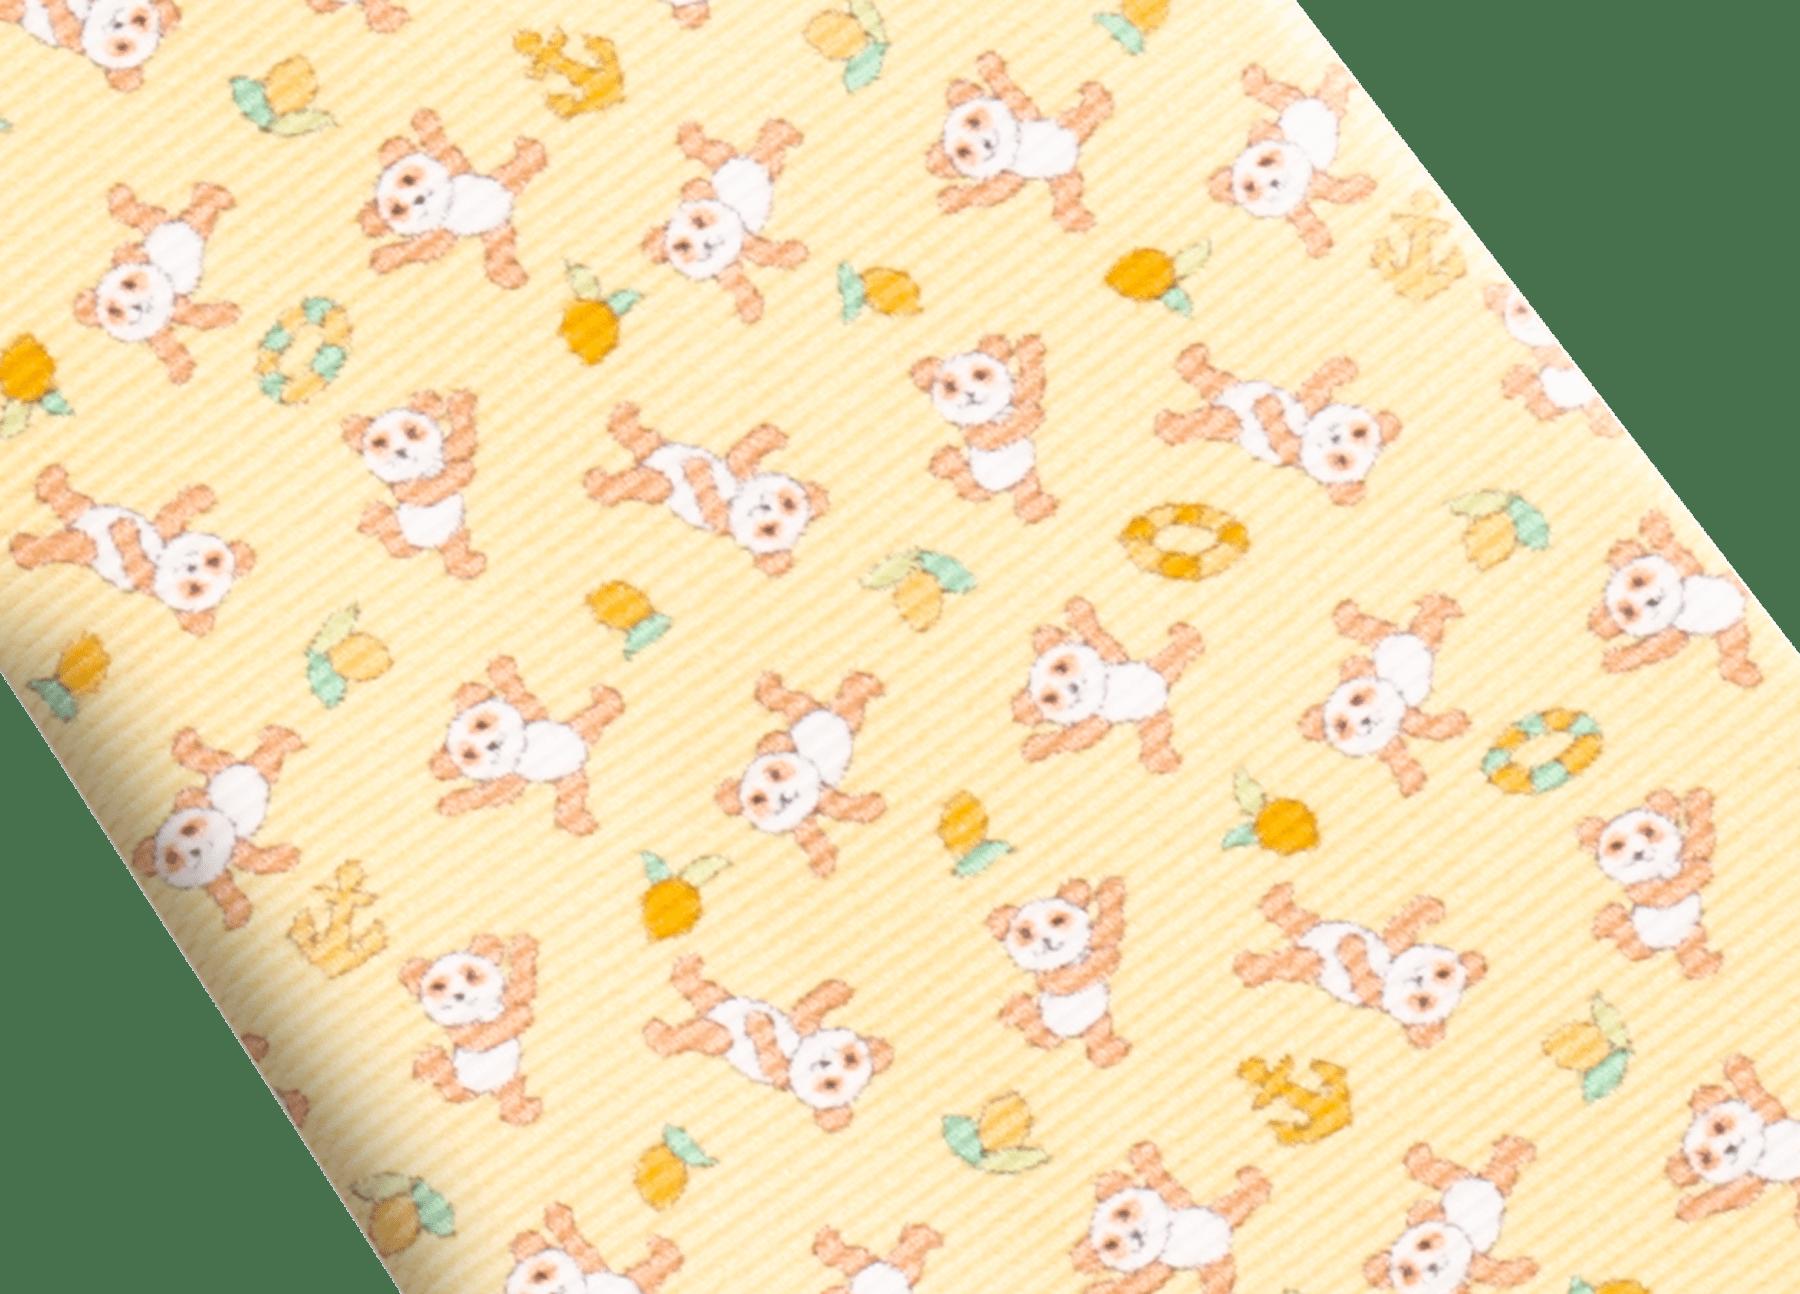 「Lemon Panda」柄があしらわれたイエローのセブンフォールドタイ。上質なサリオーネプリントシルク製。 244171 image 2